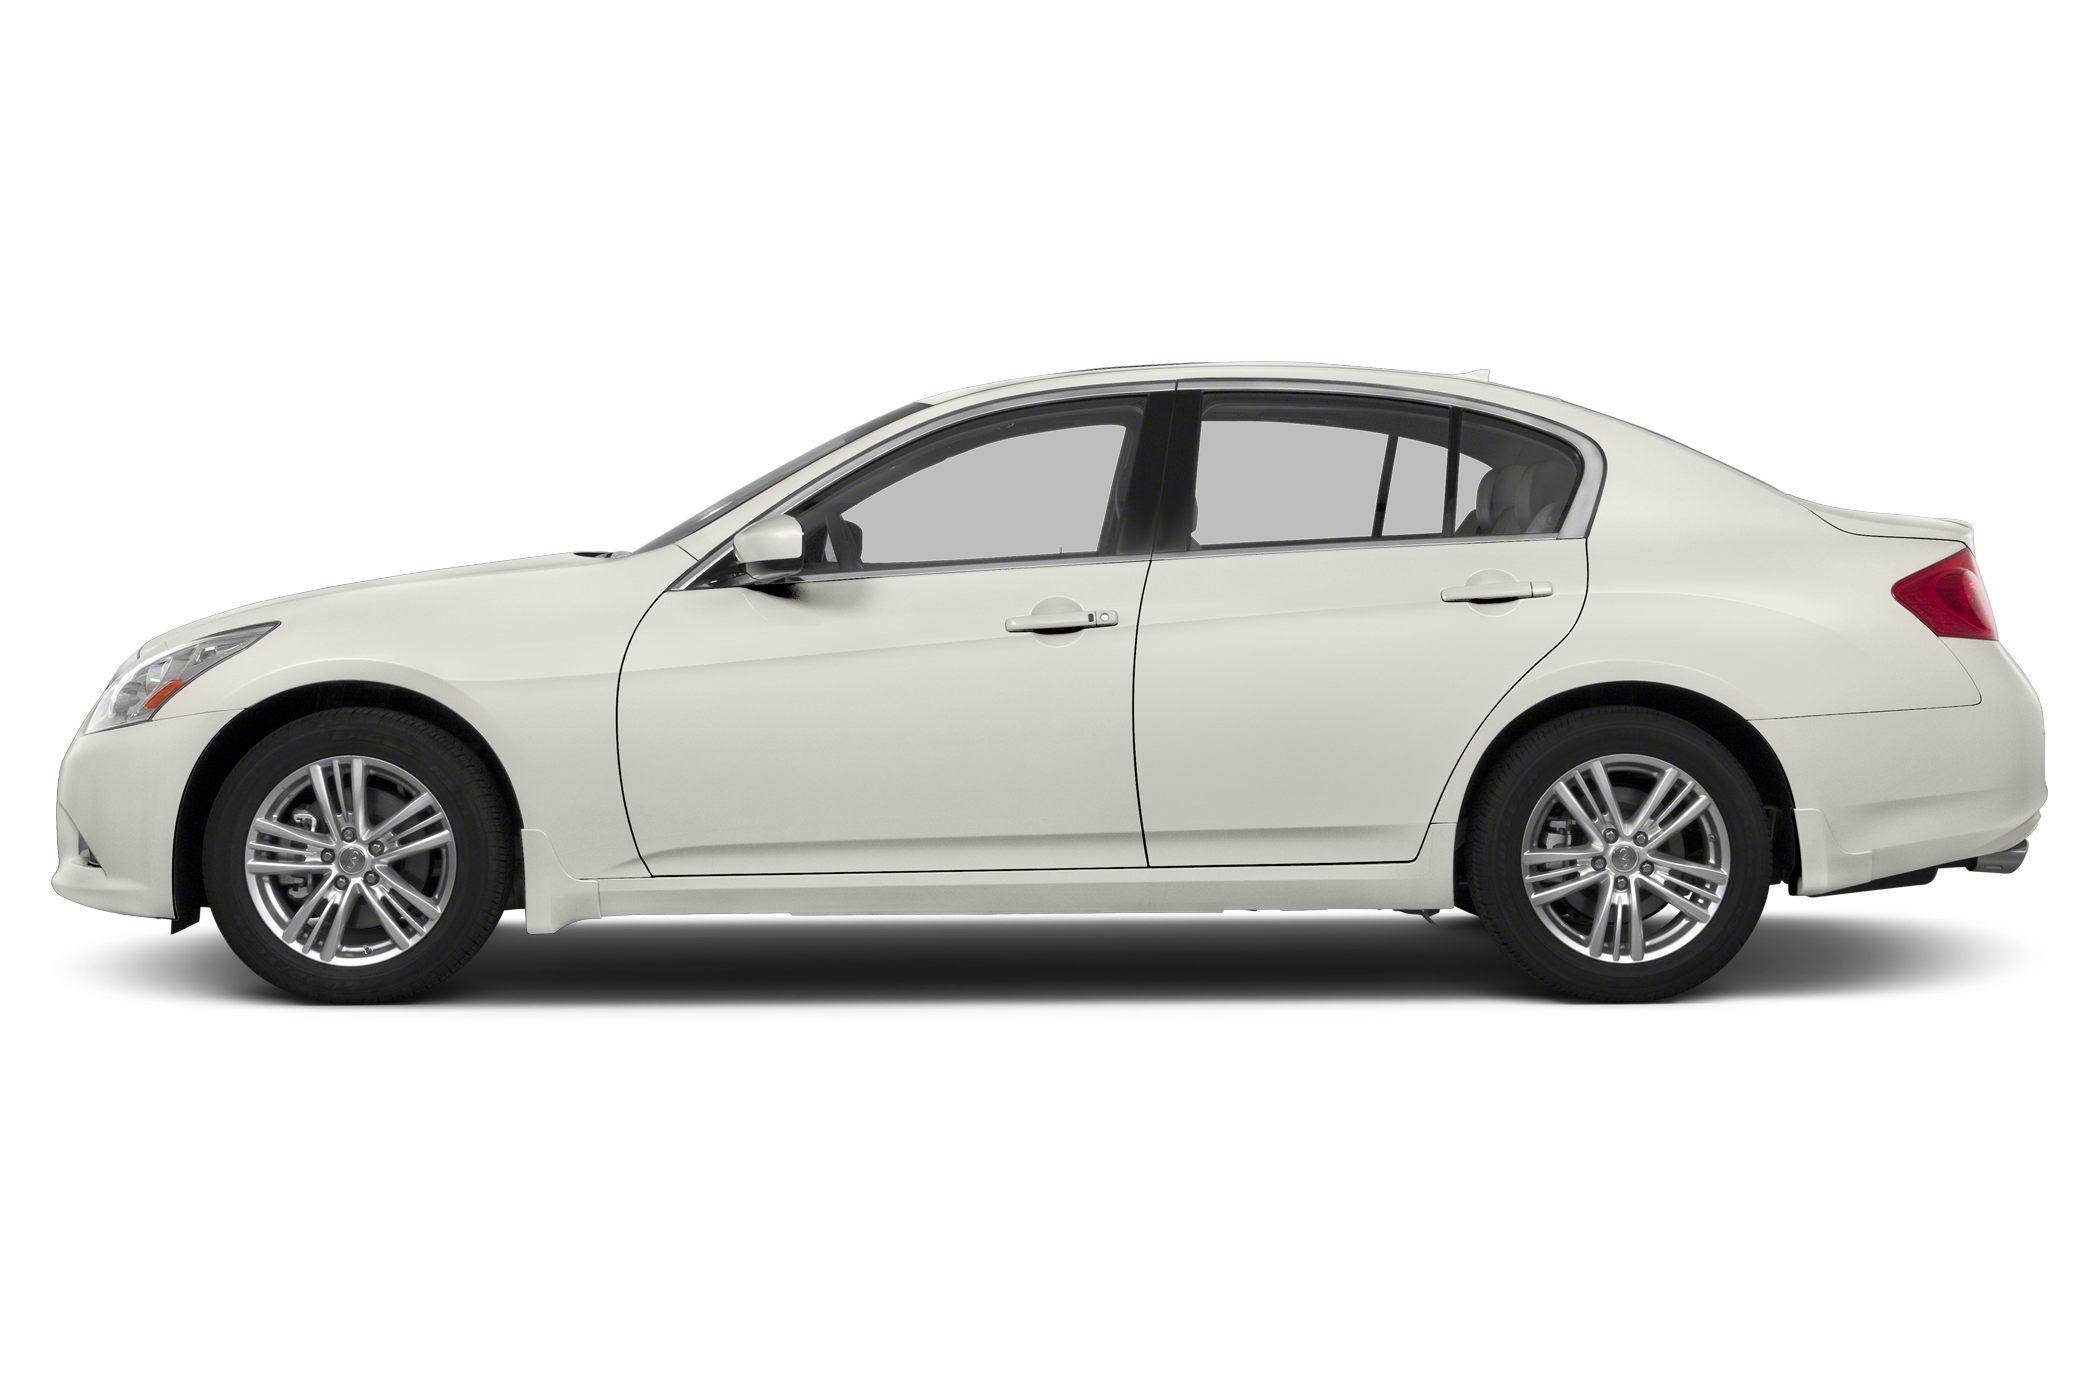 See 2013 Infiniti G37 Sedan Color Options Carsdirect